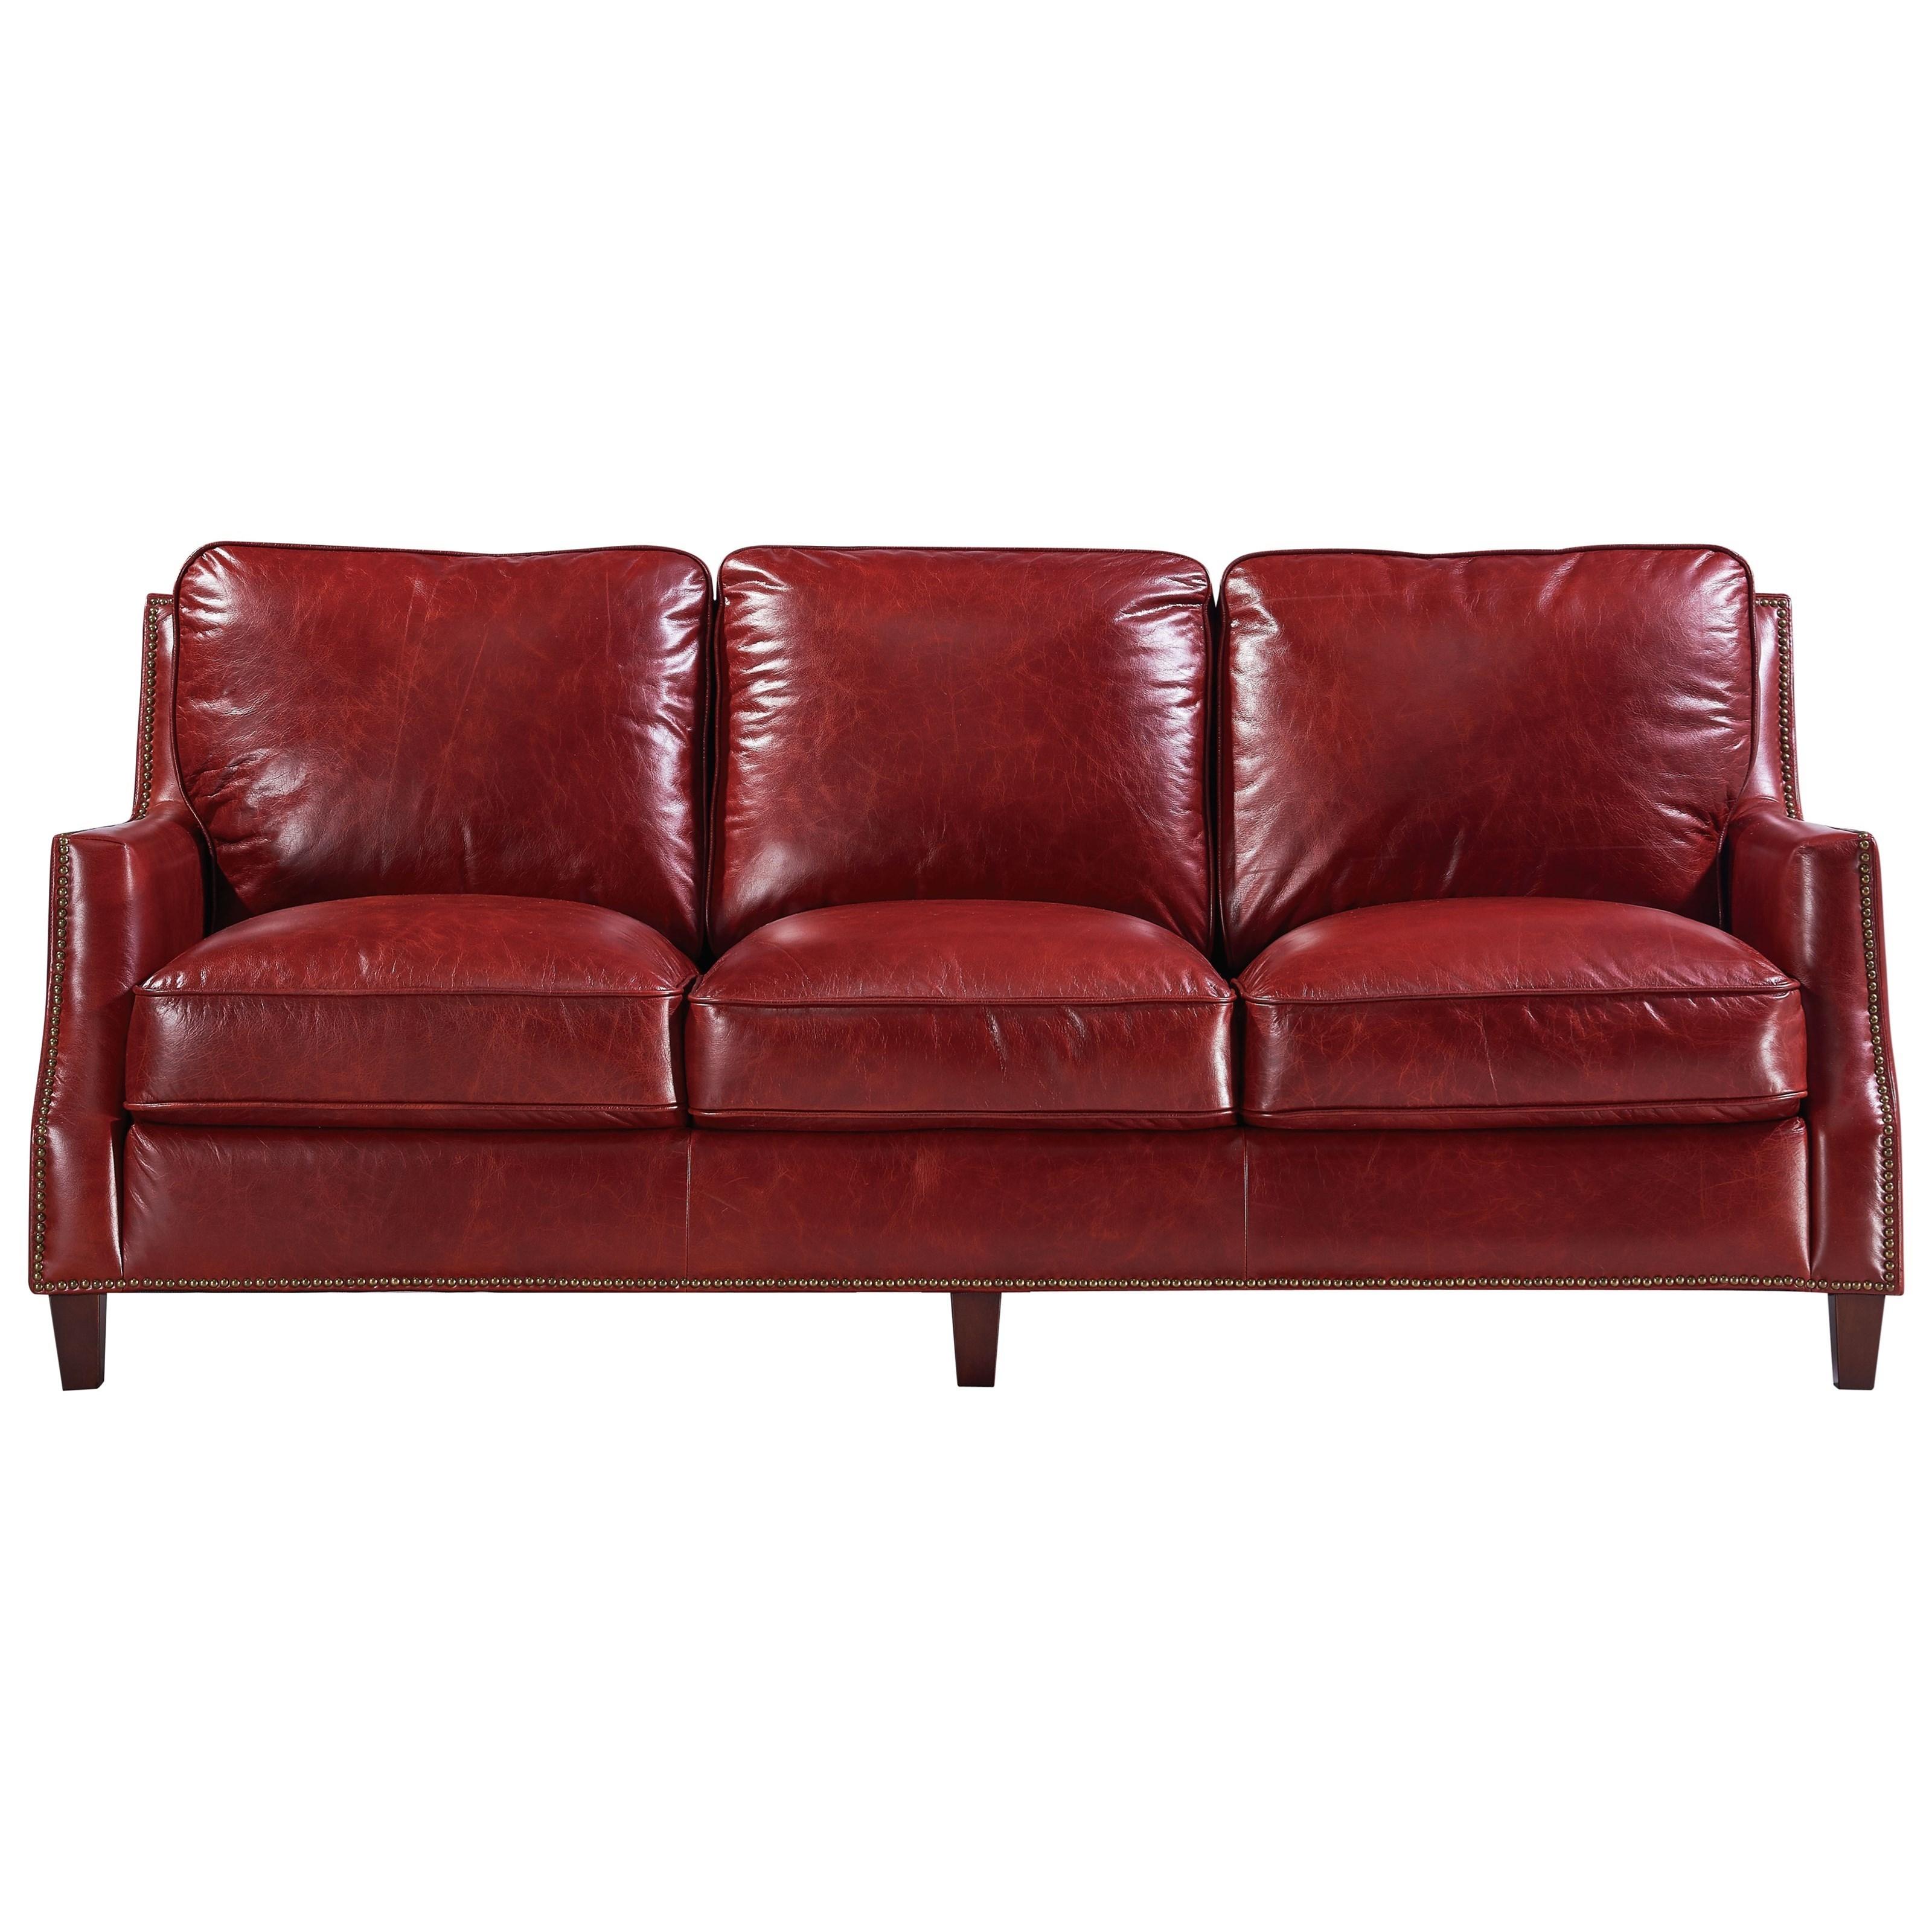 Georgetowne - Oakridge Transitional Leather Sofa with Nailhead Trim by  Leather Italia USA at Lindy\'s Furniture Company